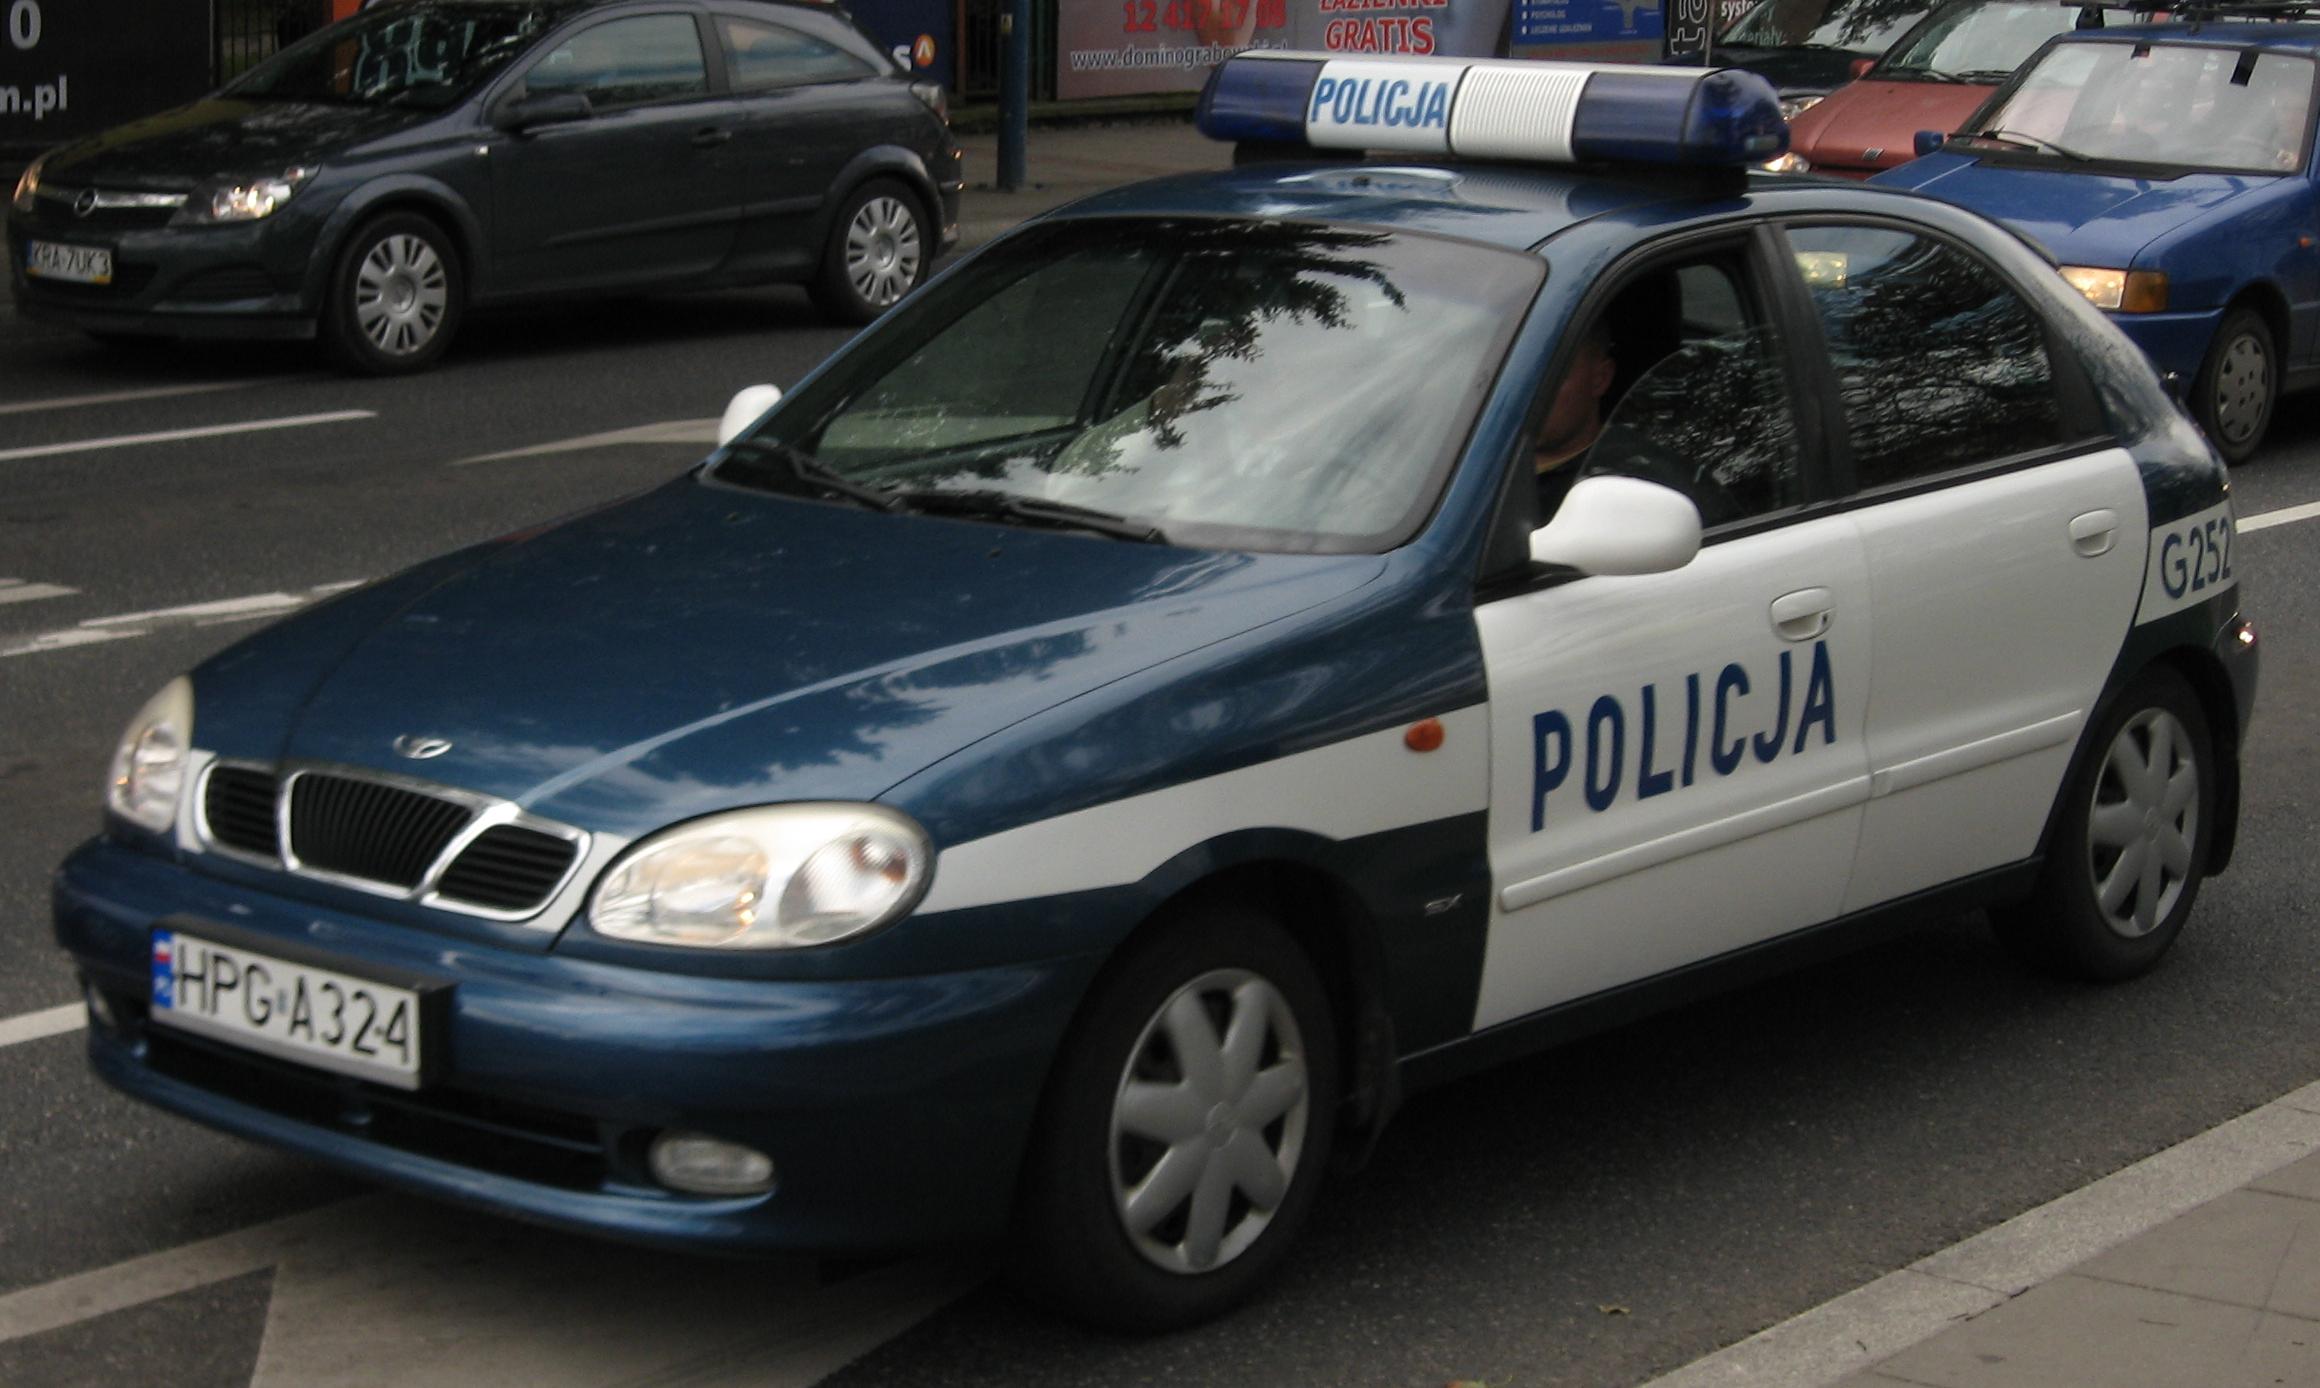 File:Daewoo Lanos police squad car of Policja on Marii Konopnickiej